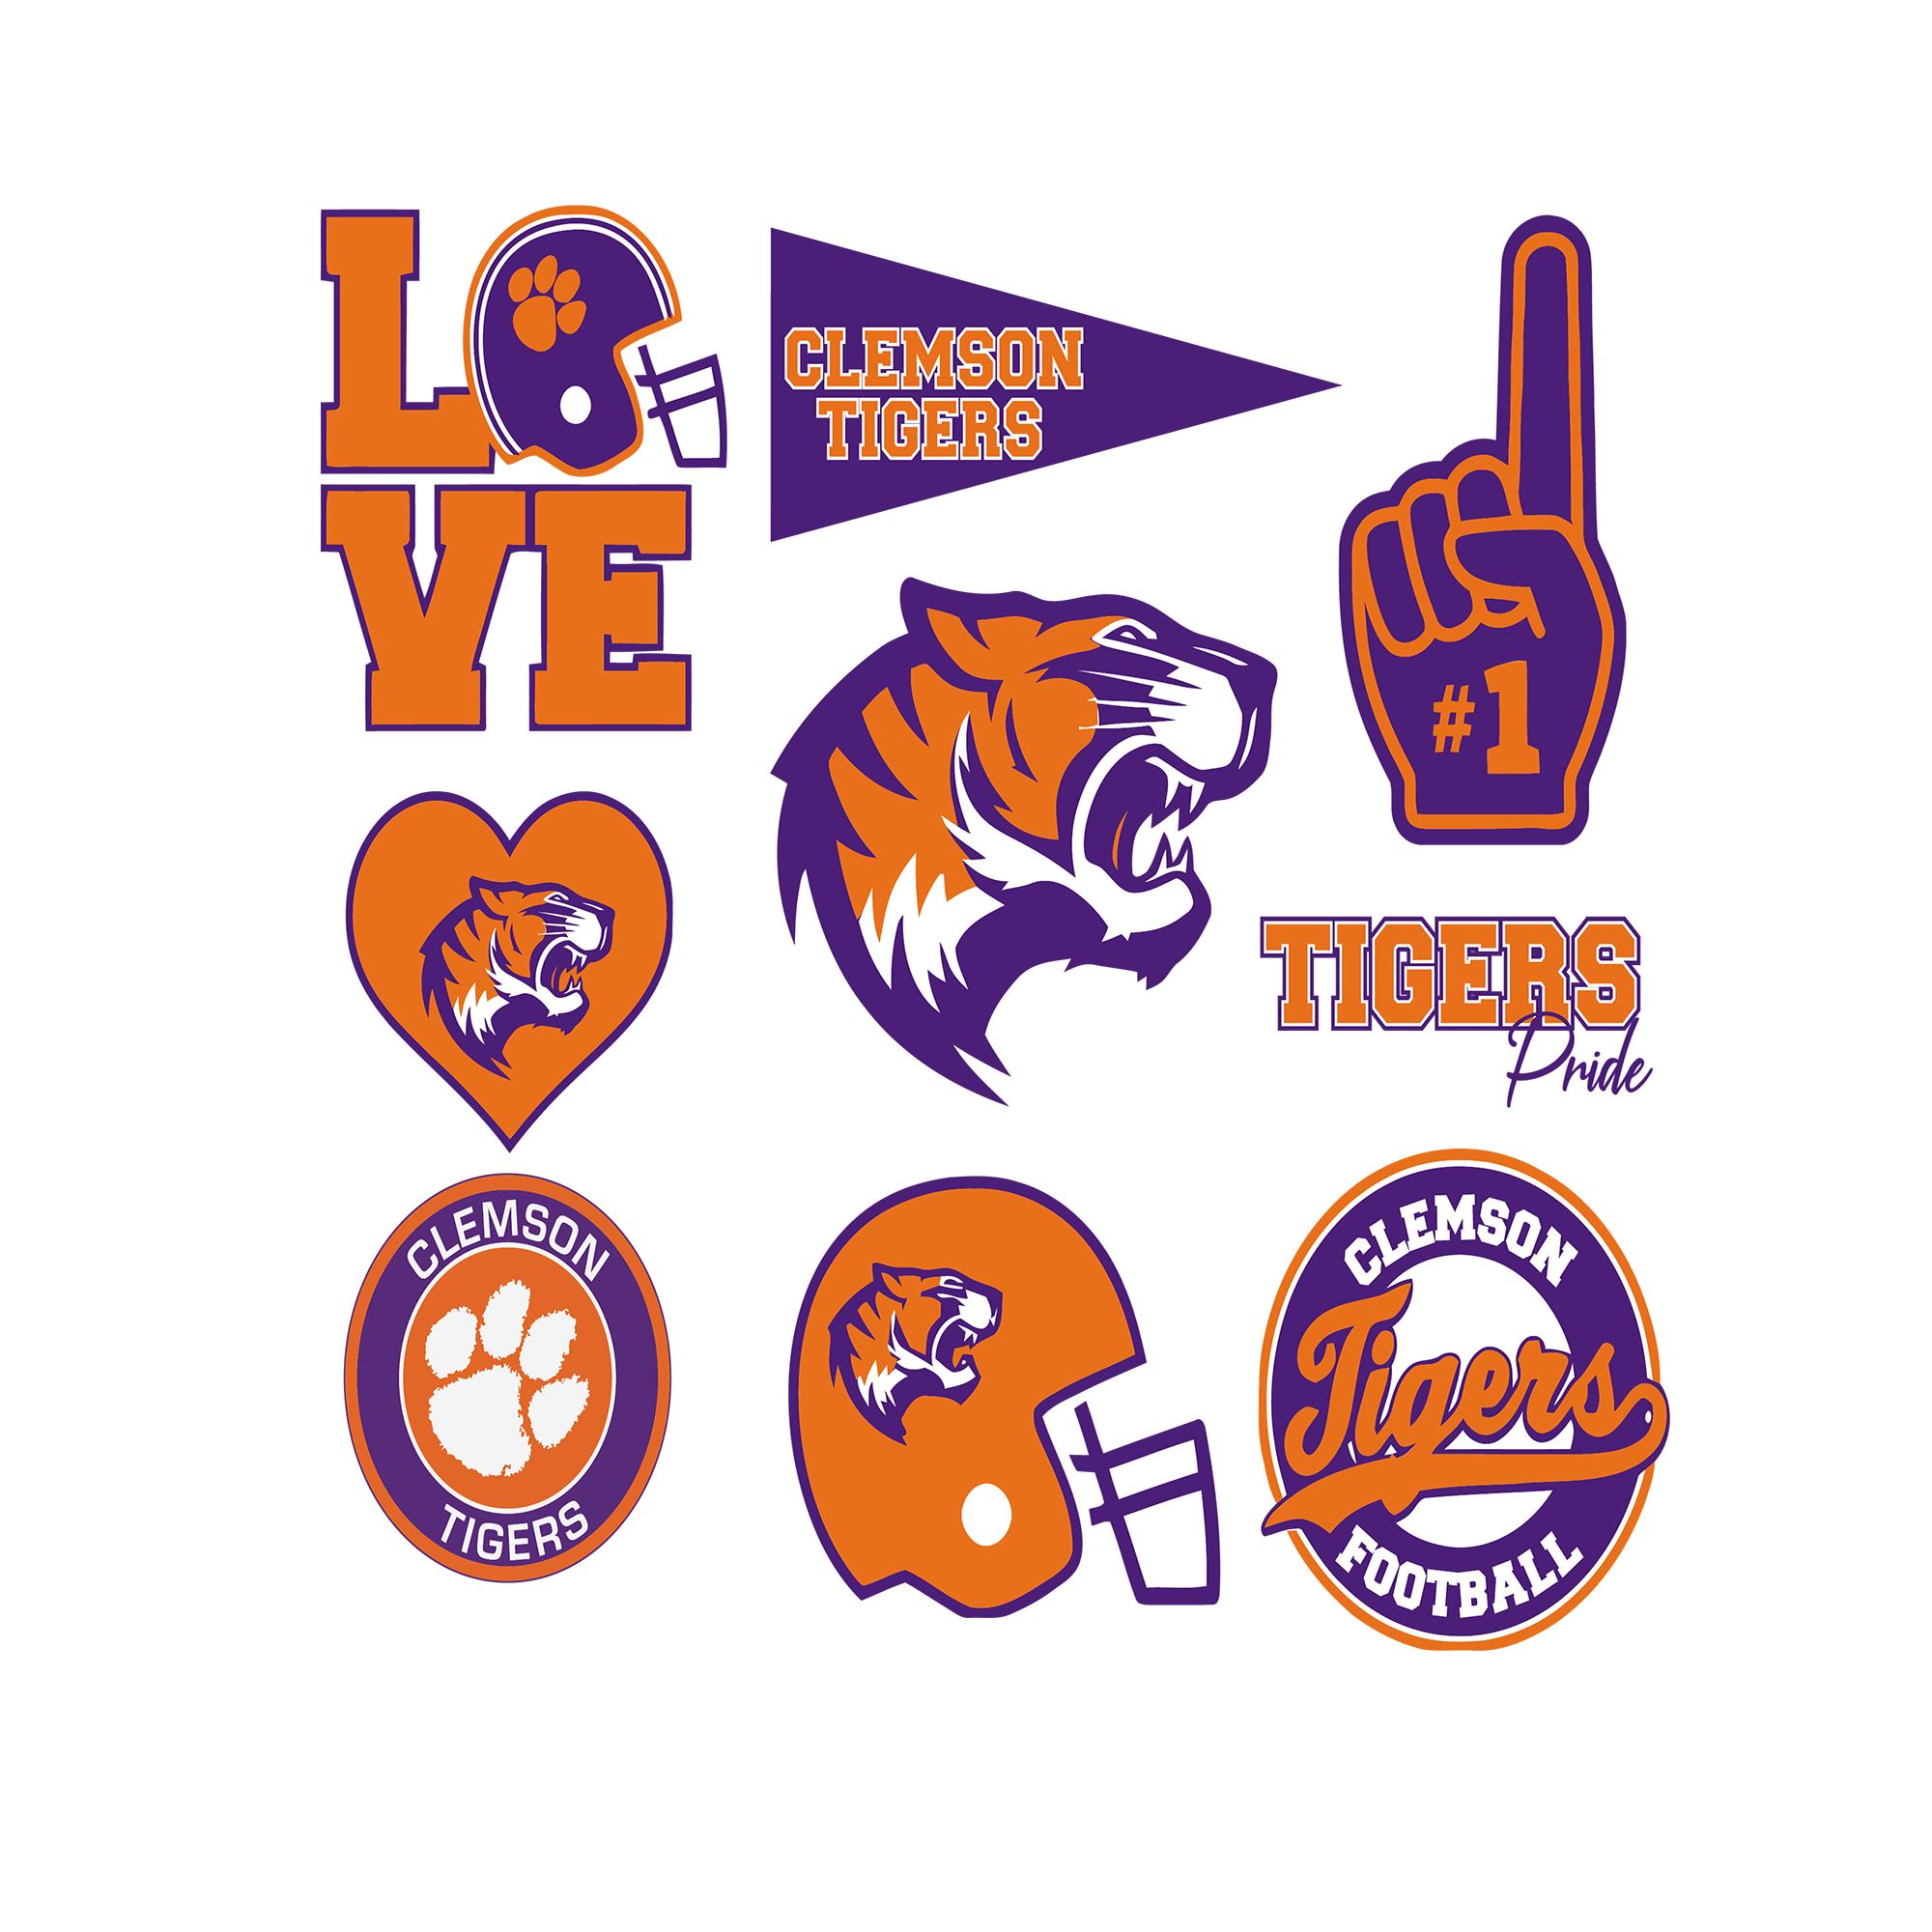 Clemson Tiger Svg 1 Football Svg Football Gift Clemson University Clemson Football Clemson Tiger Football Logo Clemson Tigers Football Football Gifts